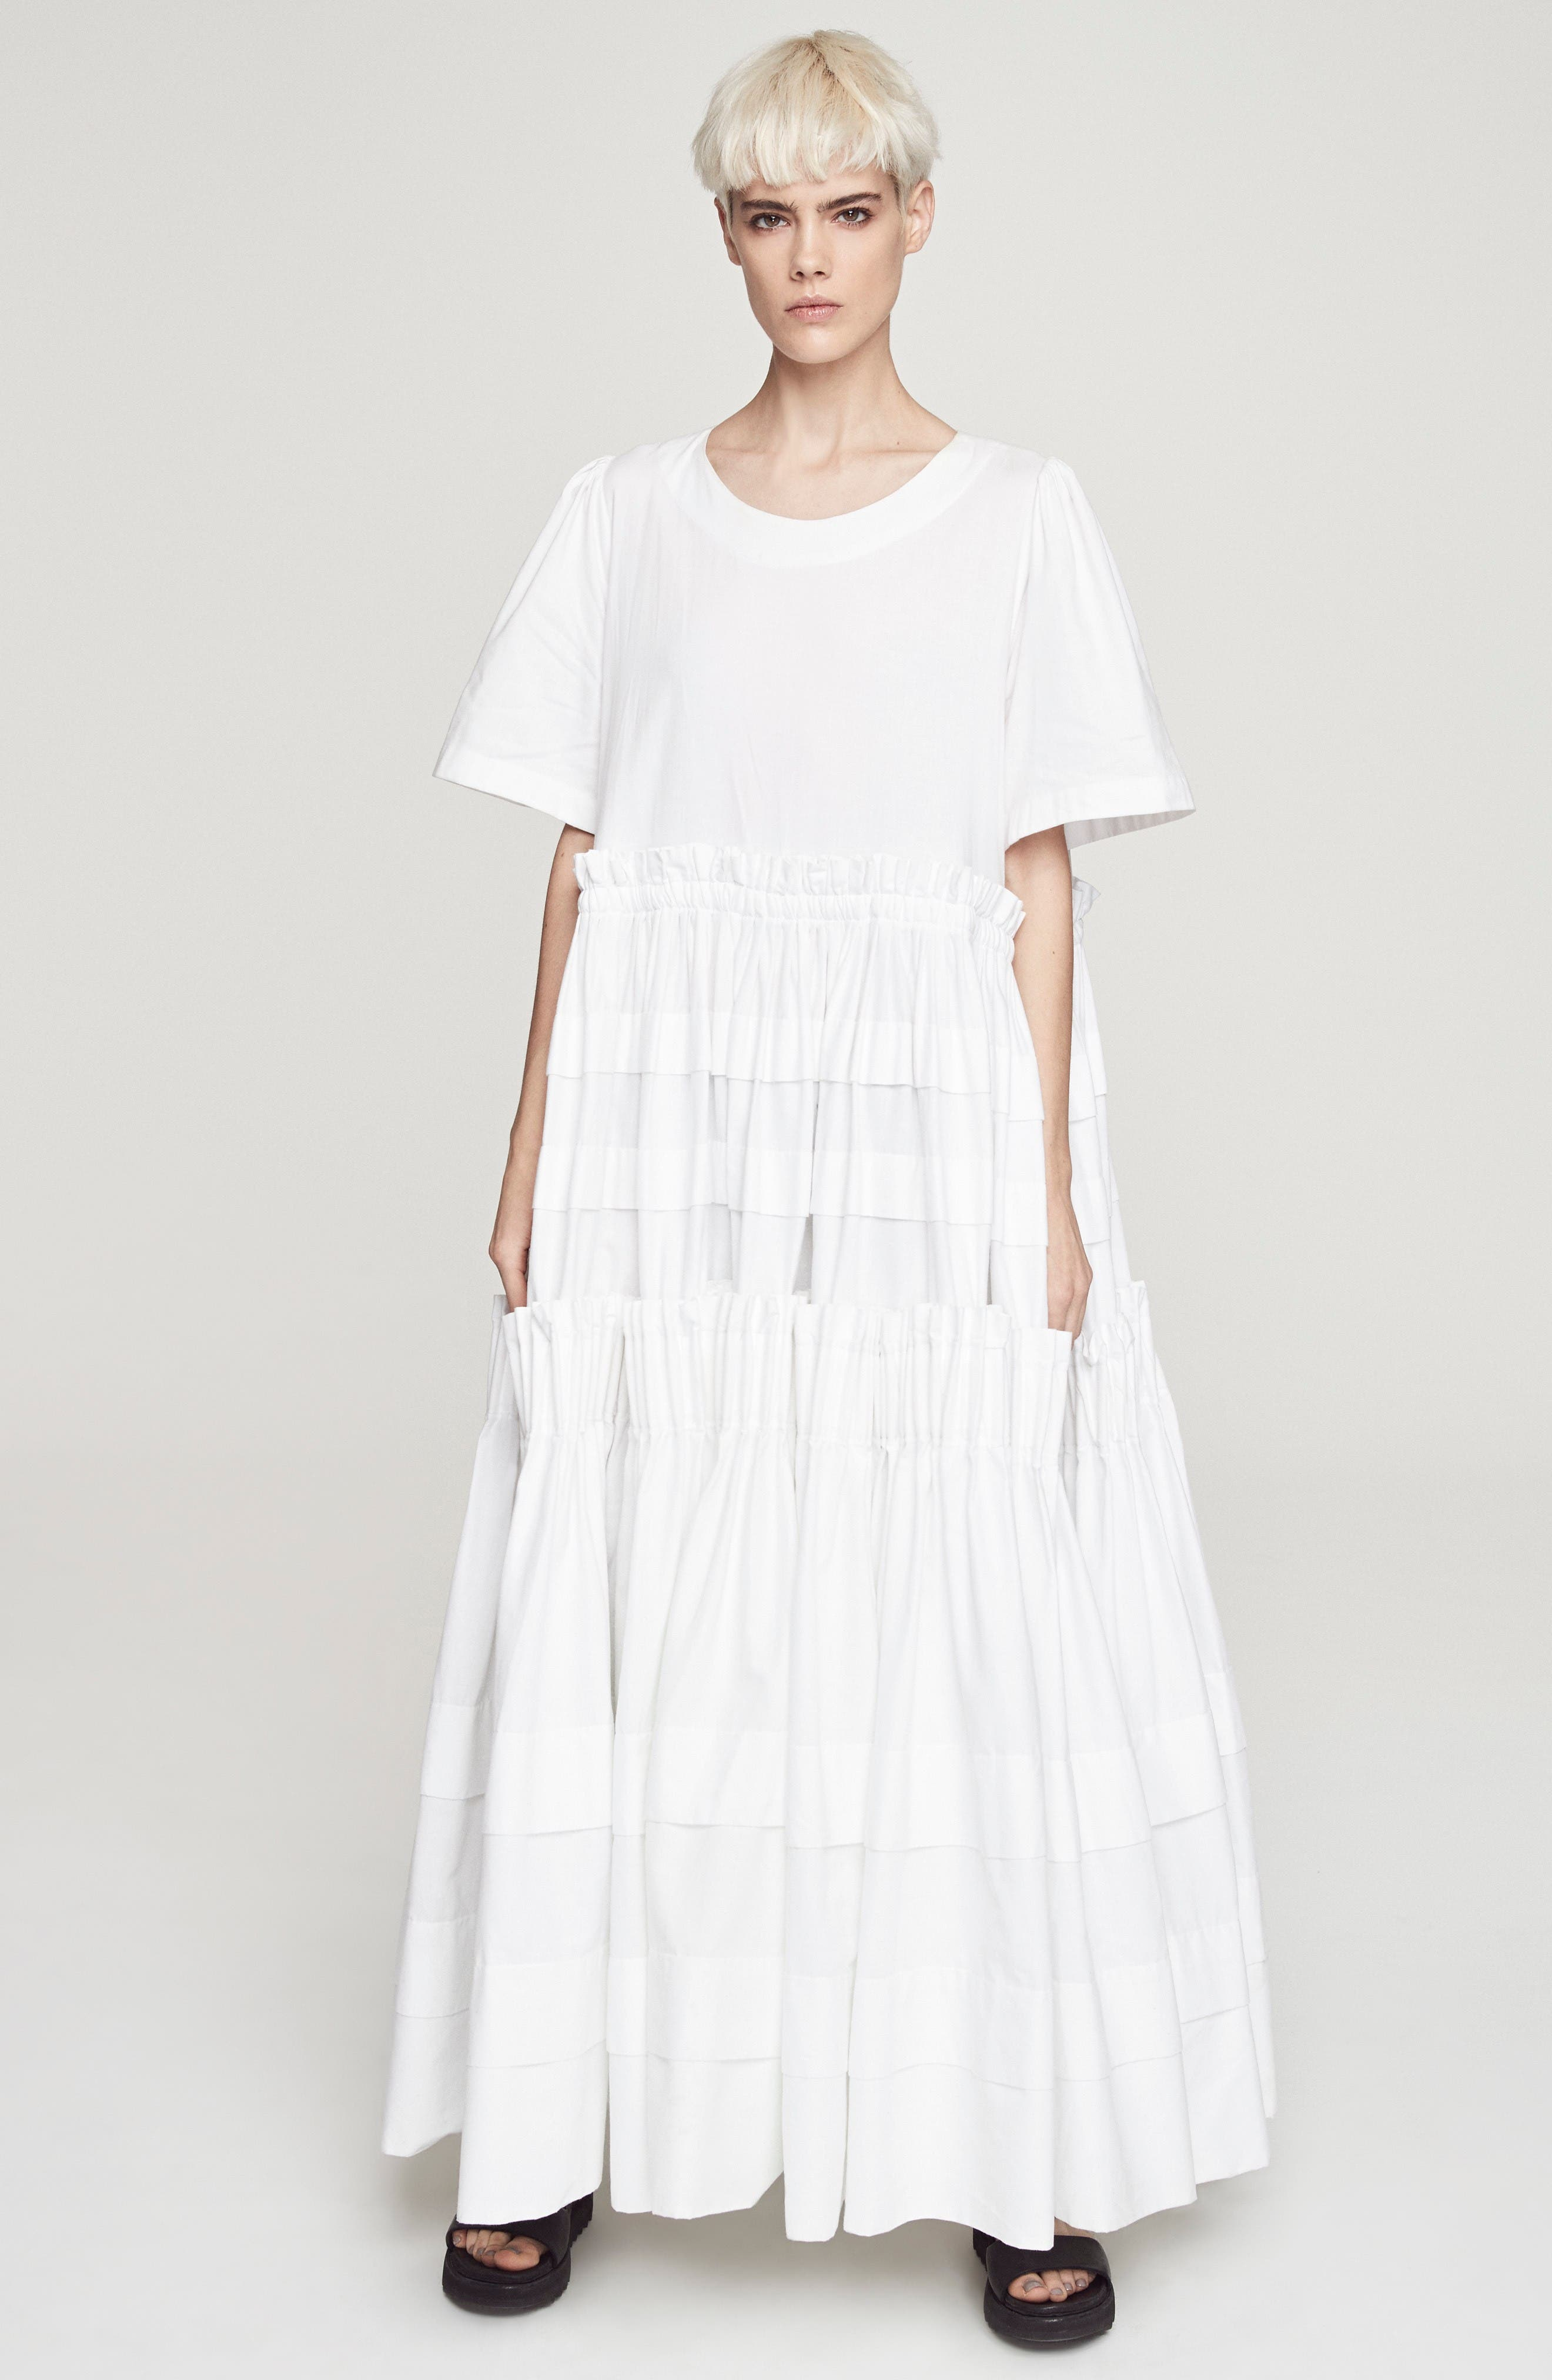 Mathilda Maxi Dress,                             Alternate thumbnail 9, color,                             White